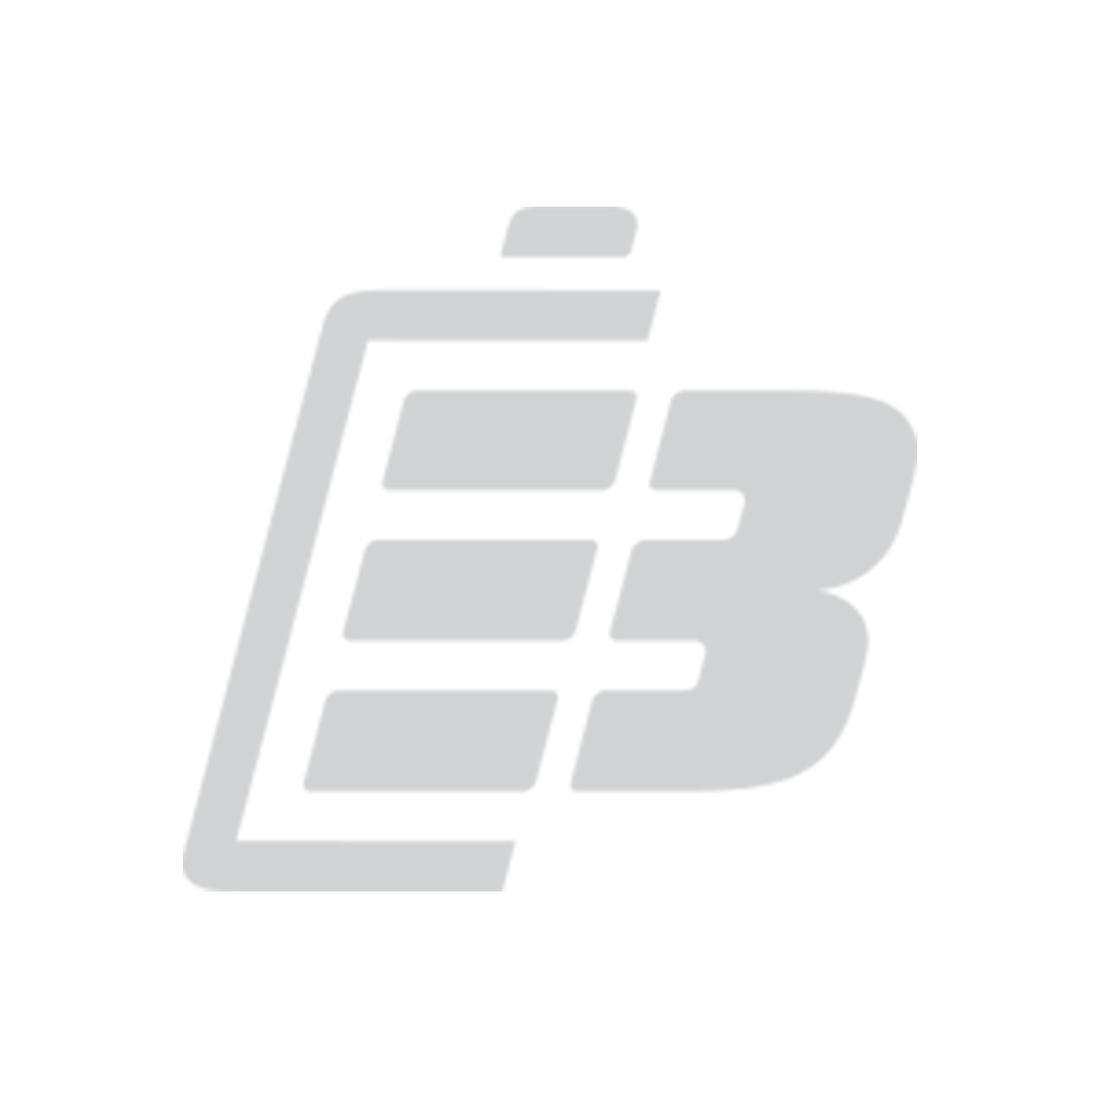 Barcode scanner battery Symbol LS3578_1